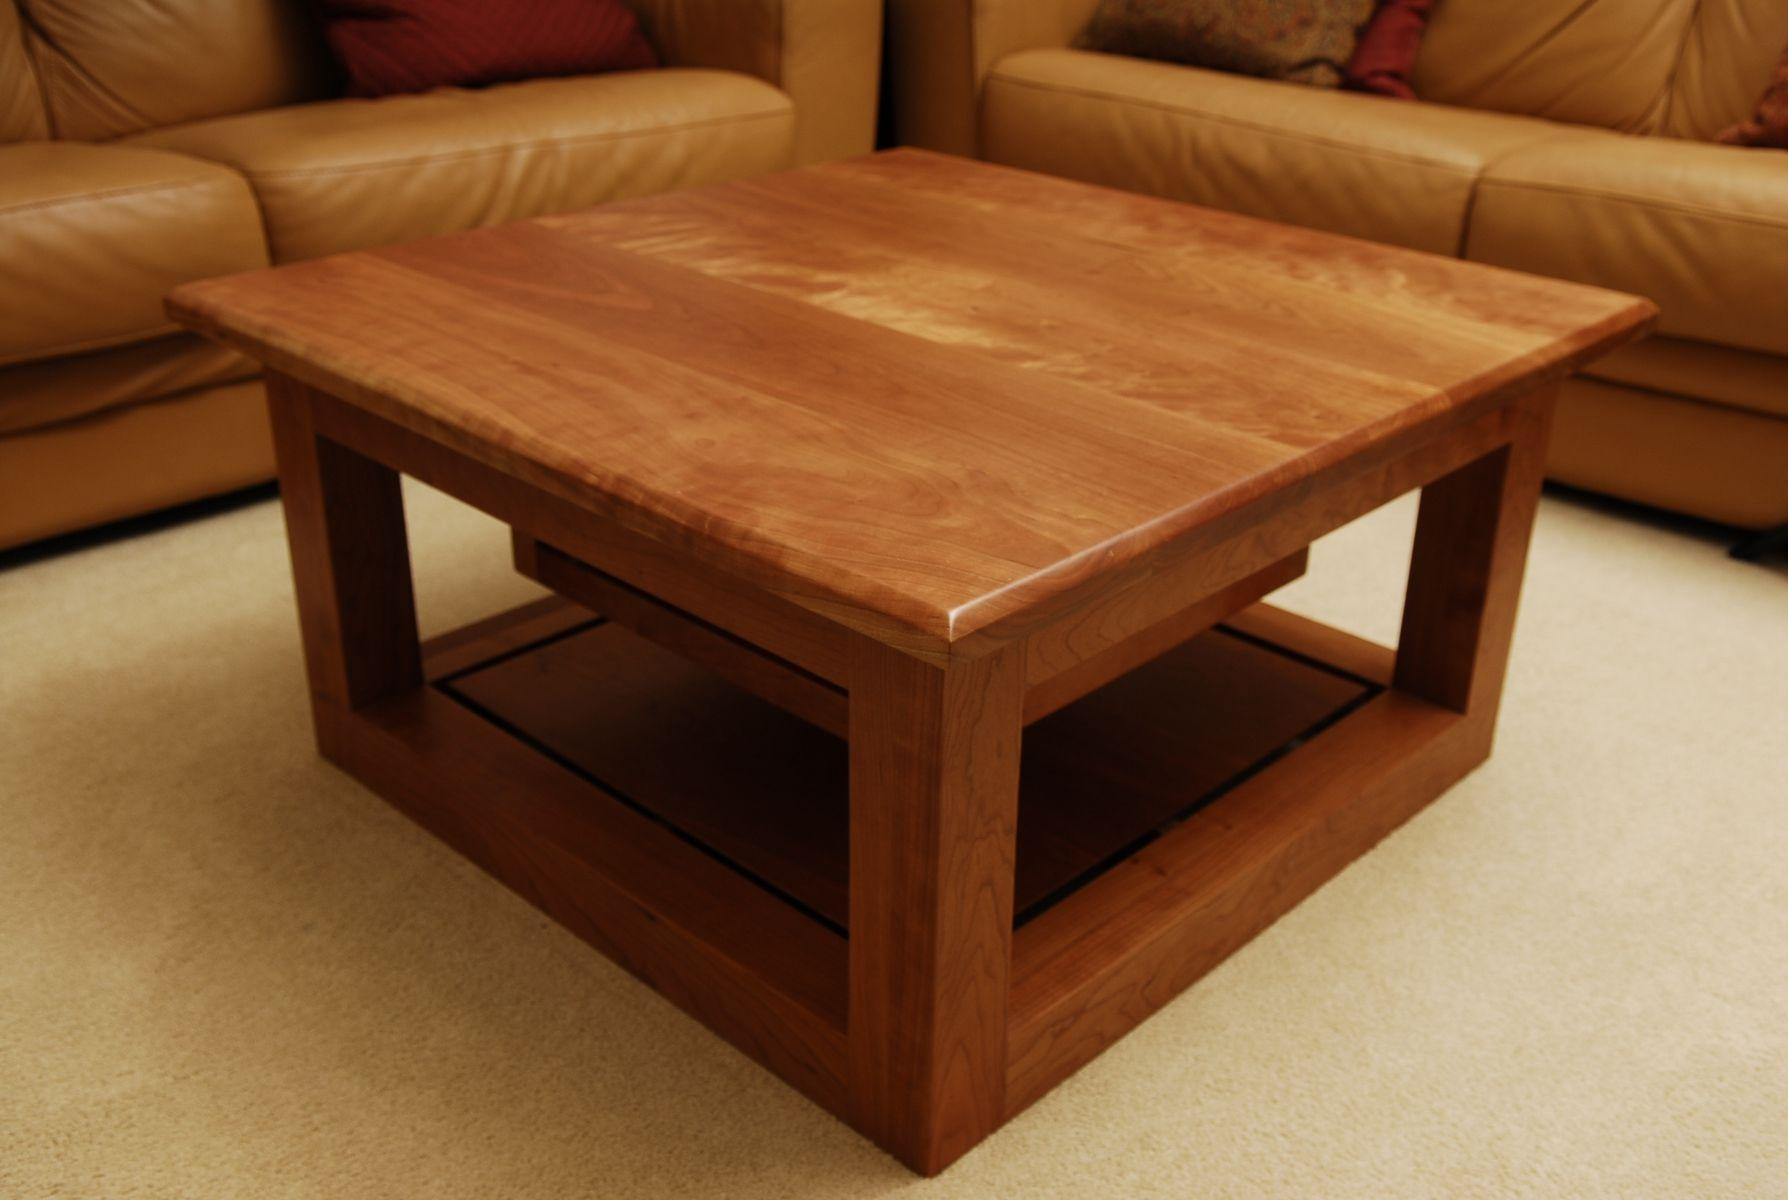 Cherry Coffee Table.Handmade Cherry Coffee Table By Schmitt Custom Furniture